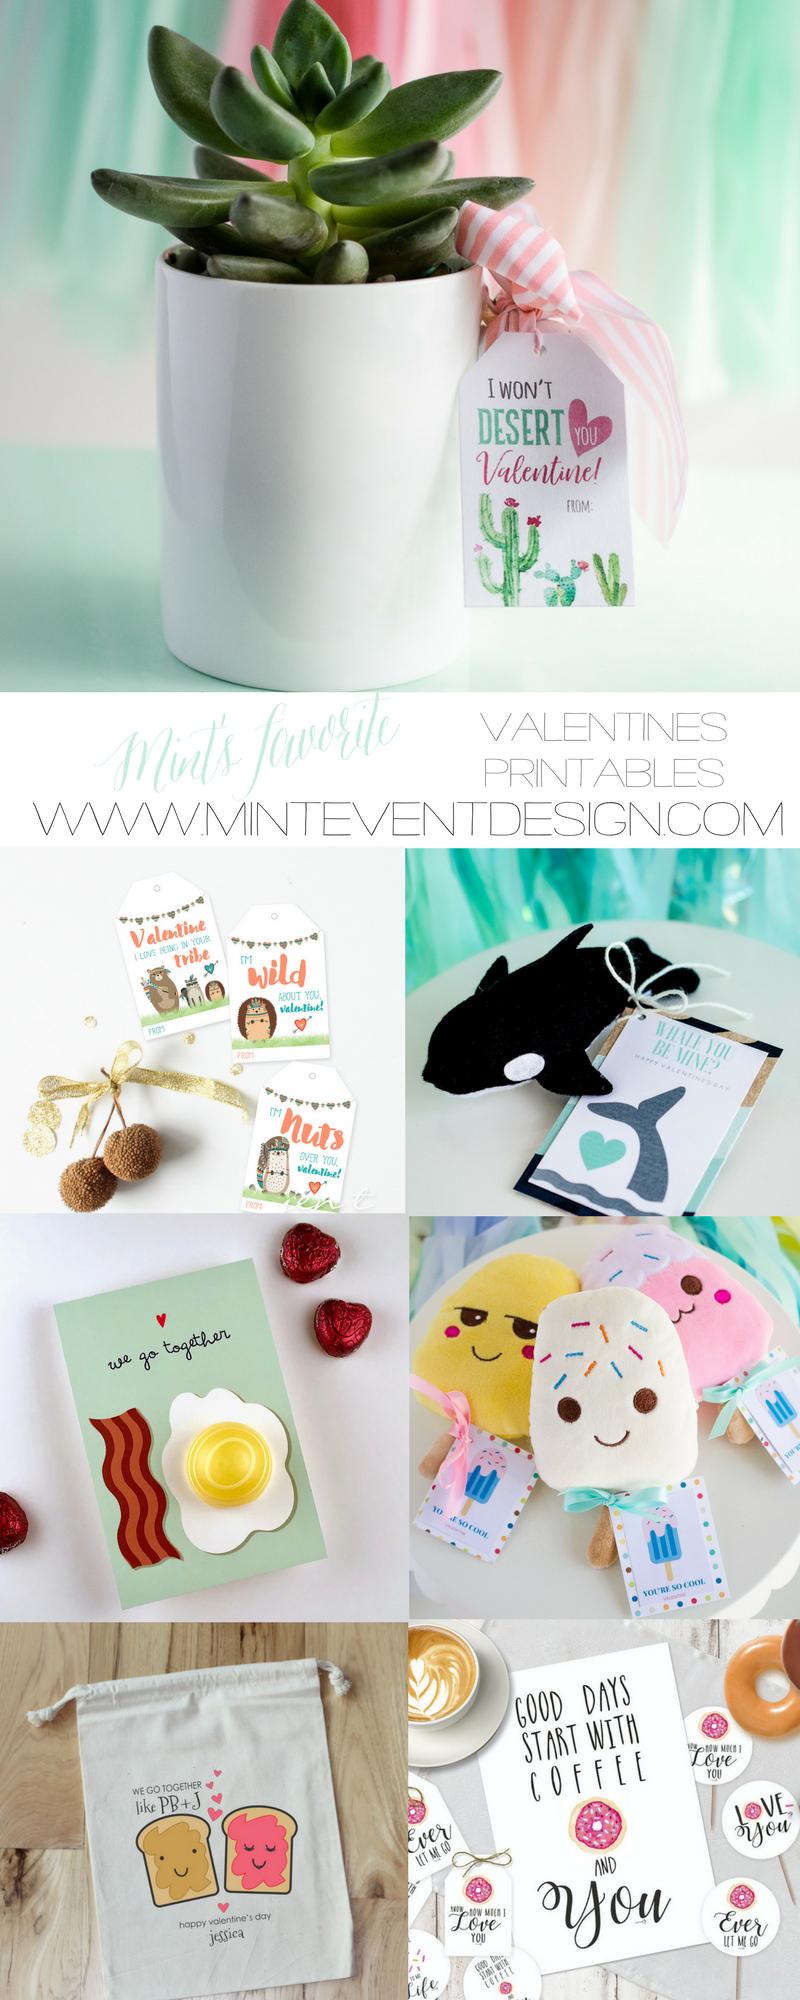 Valentines printables ideas / Valentines classmate gifts / Valentines gift tags / www.minteventdesign.com